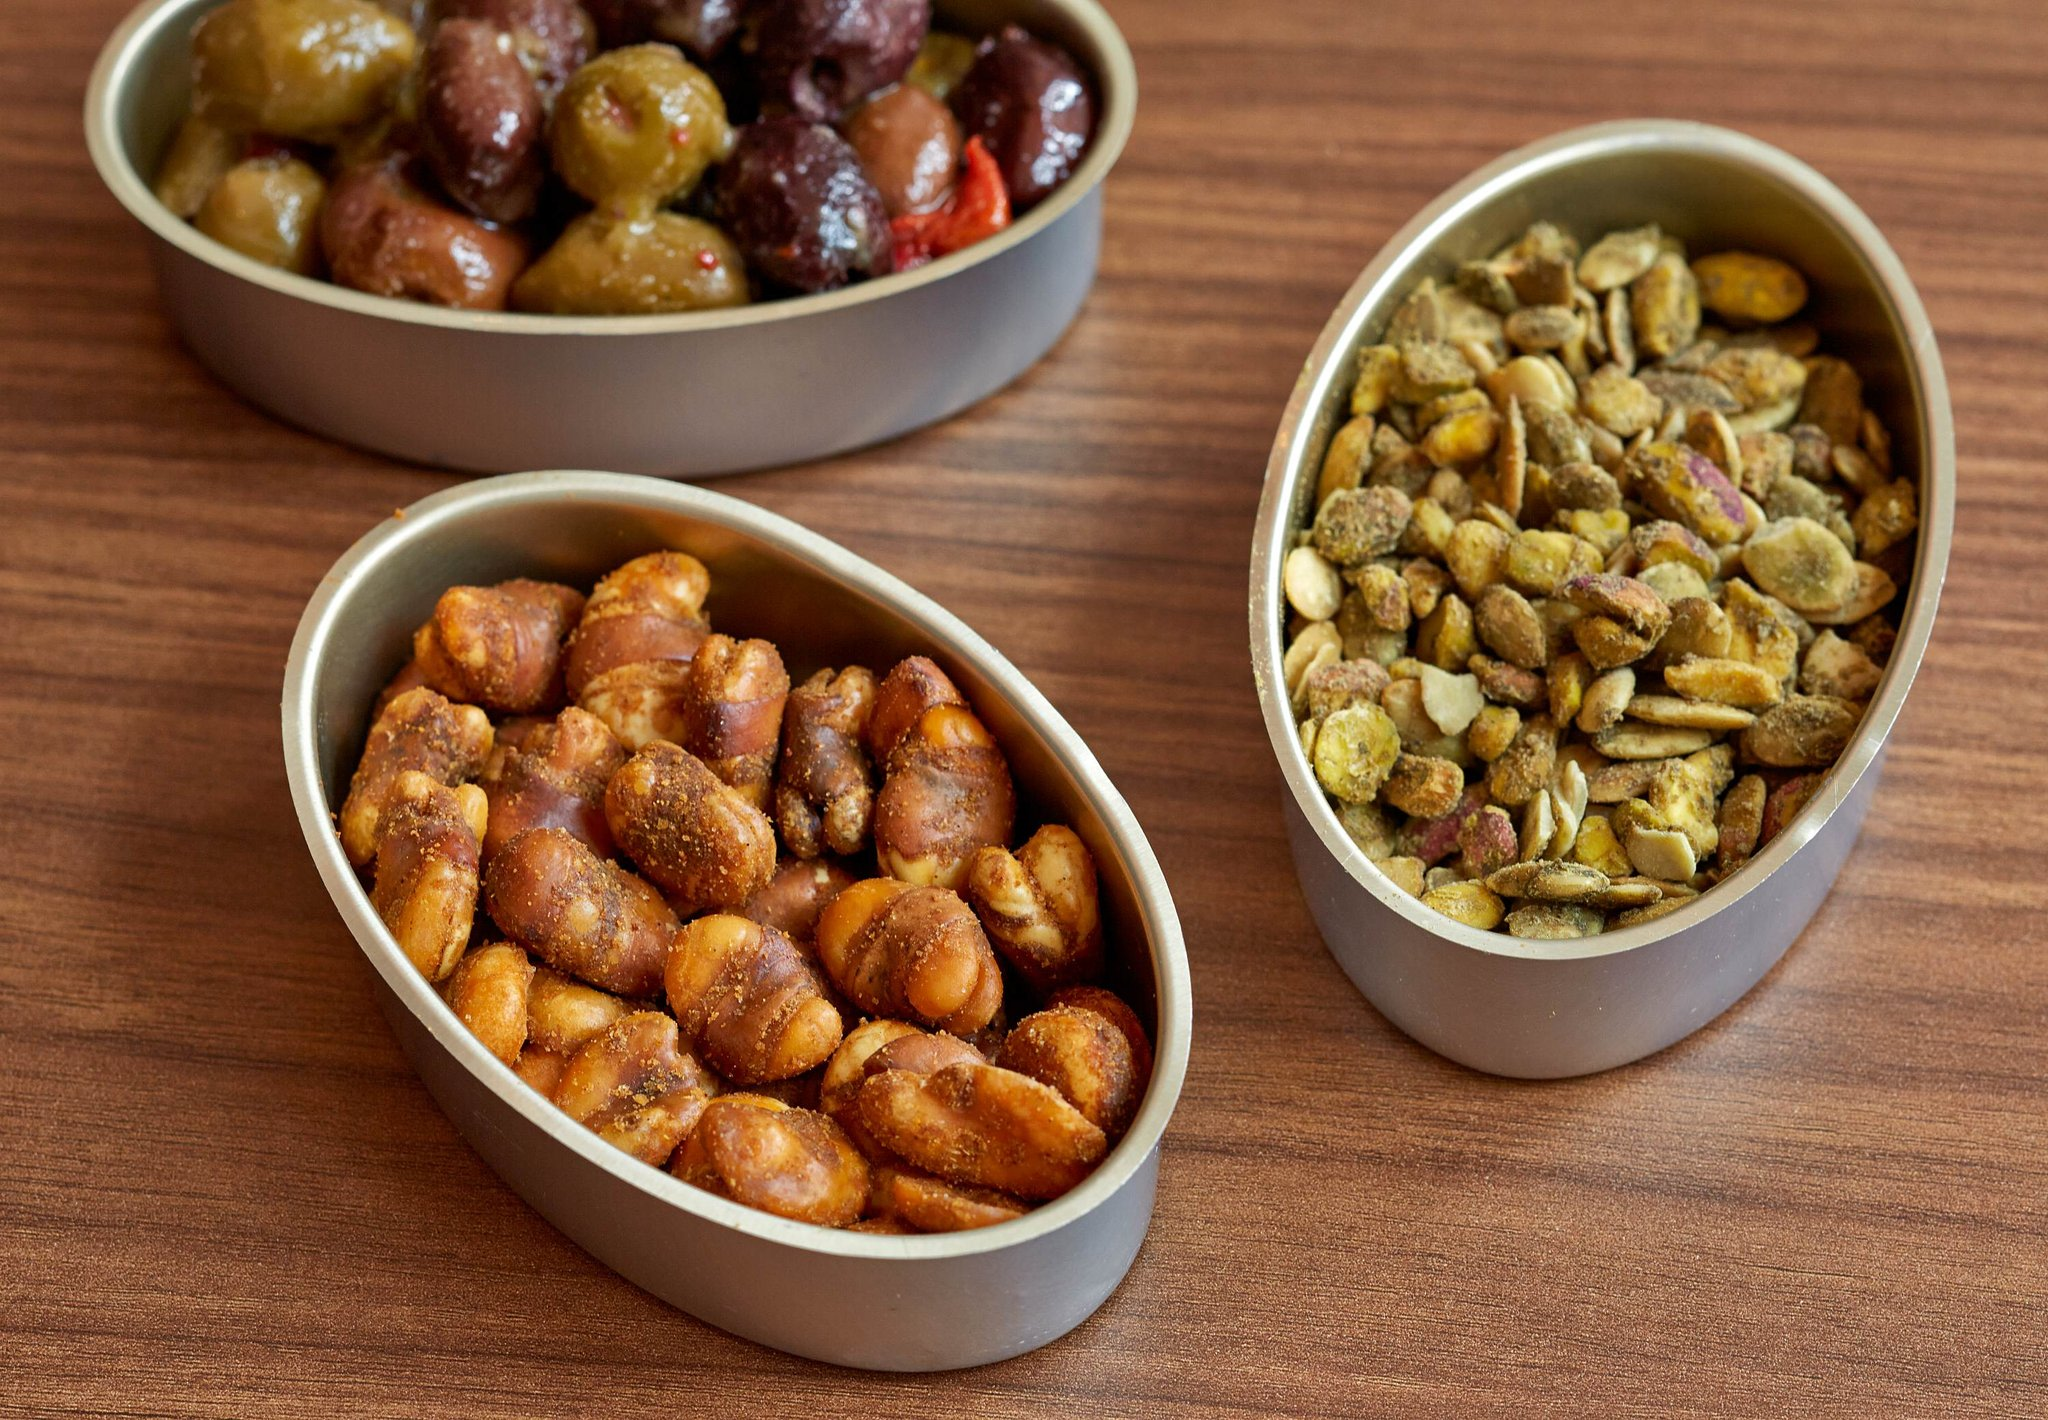 AC Lounge - Pistachio, Pepitas, Olives & Fava Beans